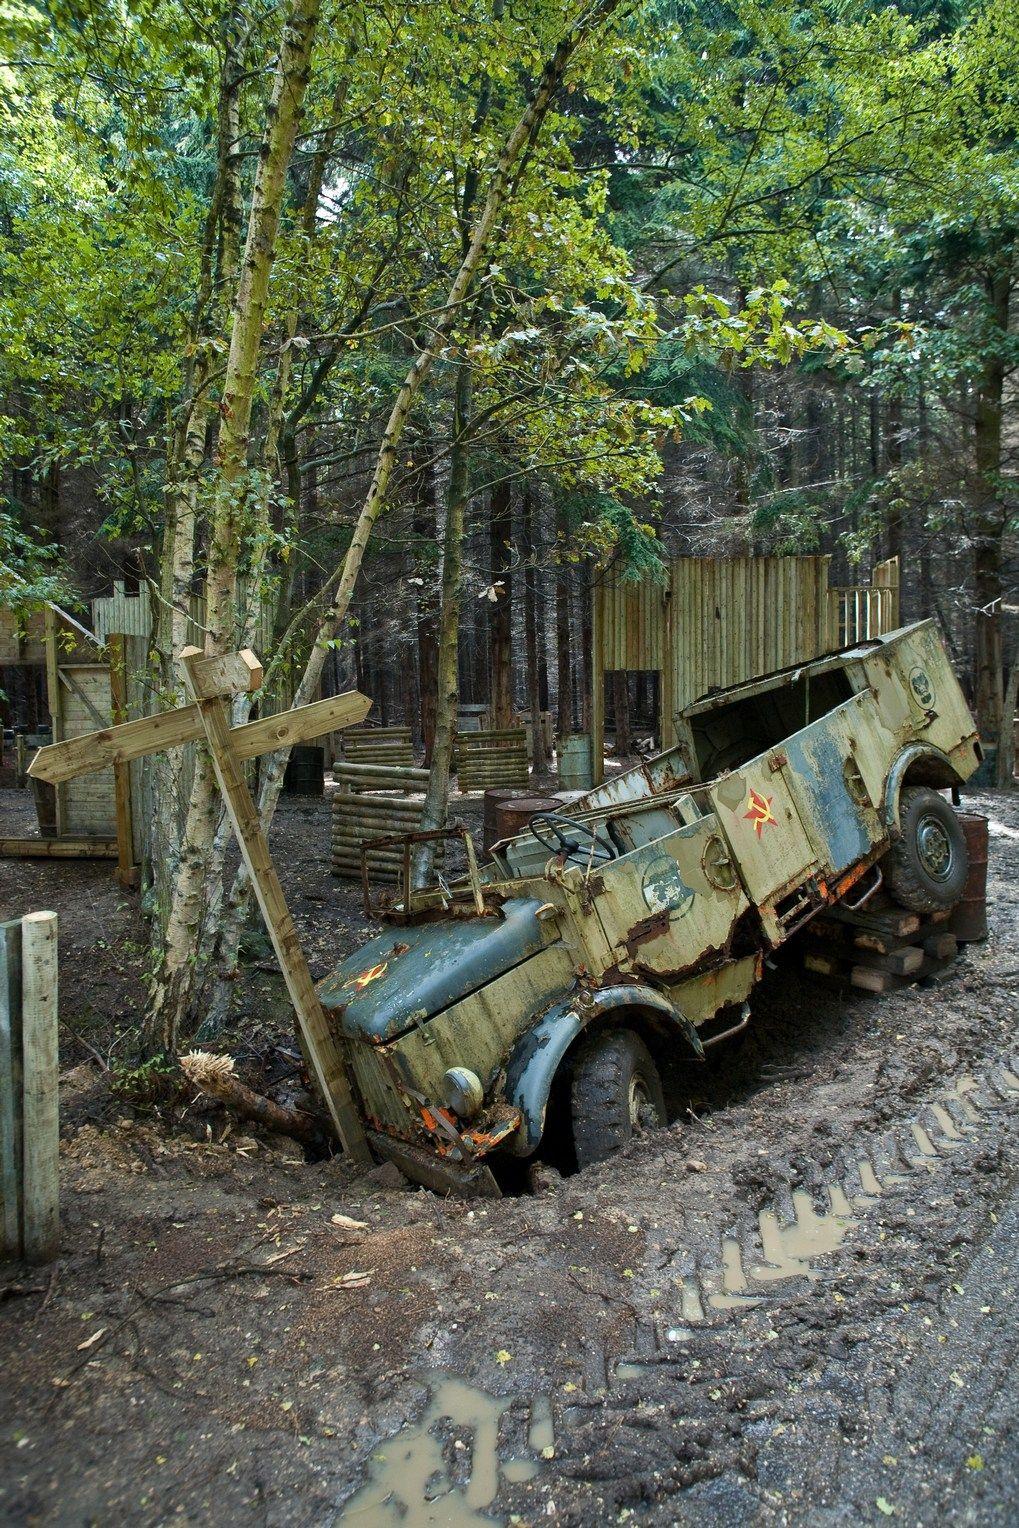 Sovietera military truck, direct from the 007 movie